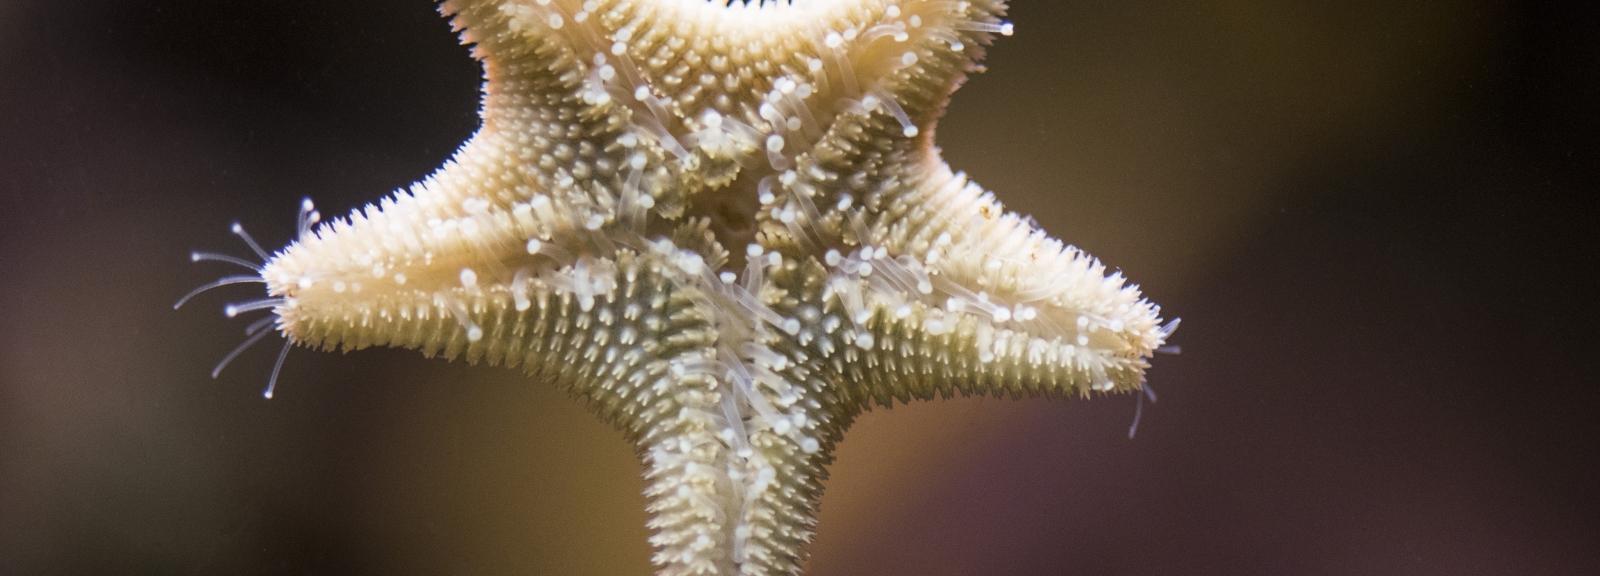 Etoile de mer Astérine bossue © MNHN - Agnès Iatzoura